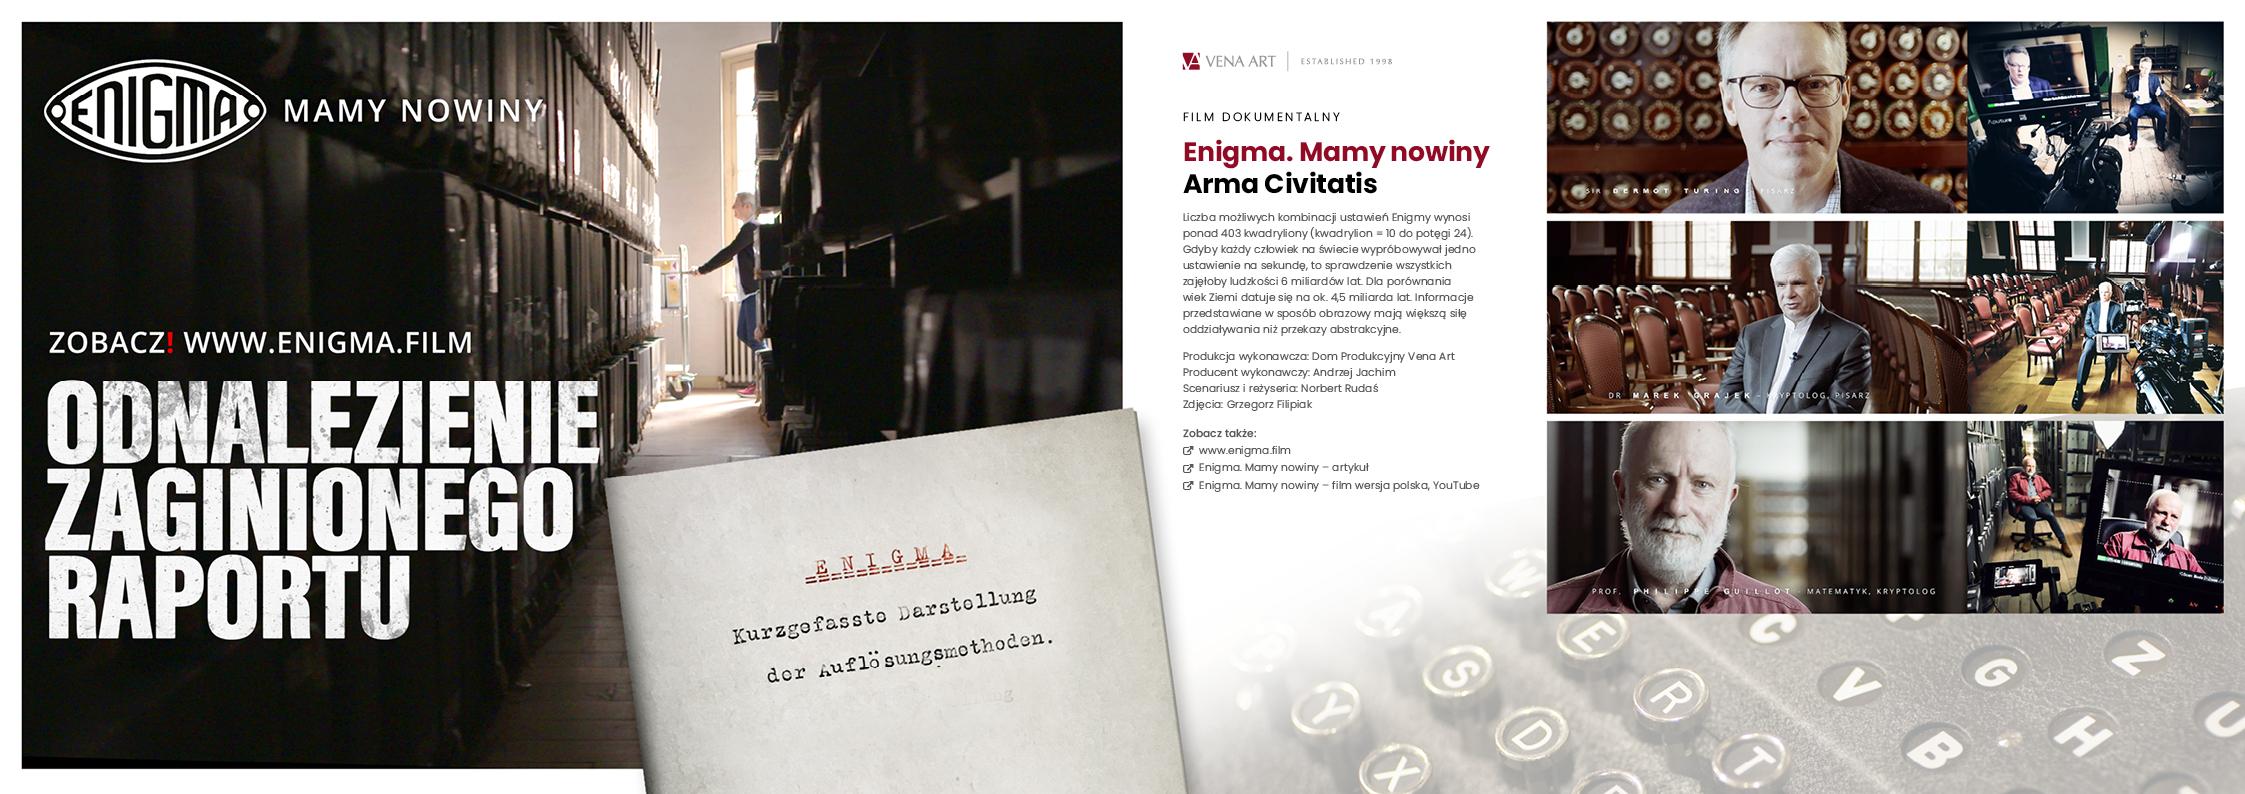 Enigma. Mamy nowiny —Arma Civitatis